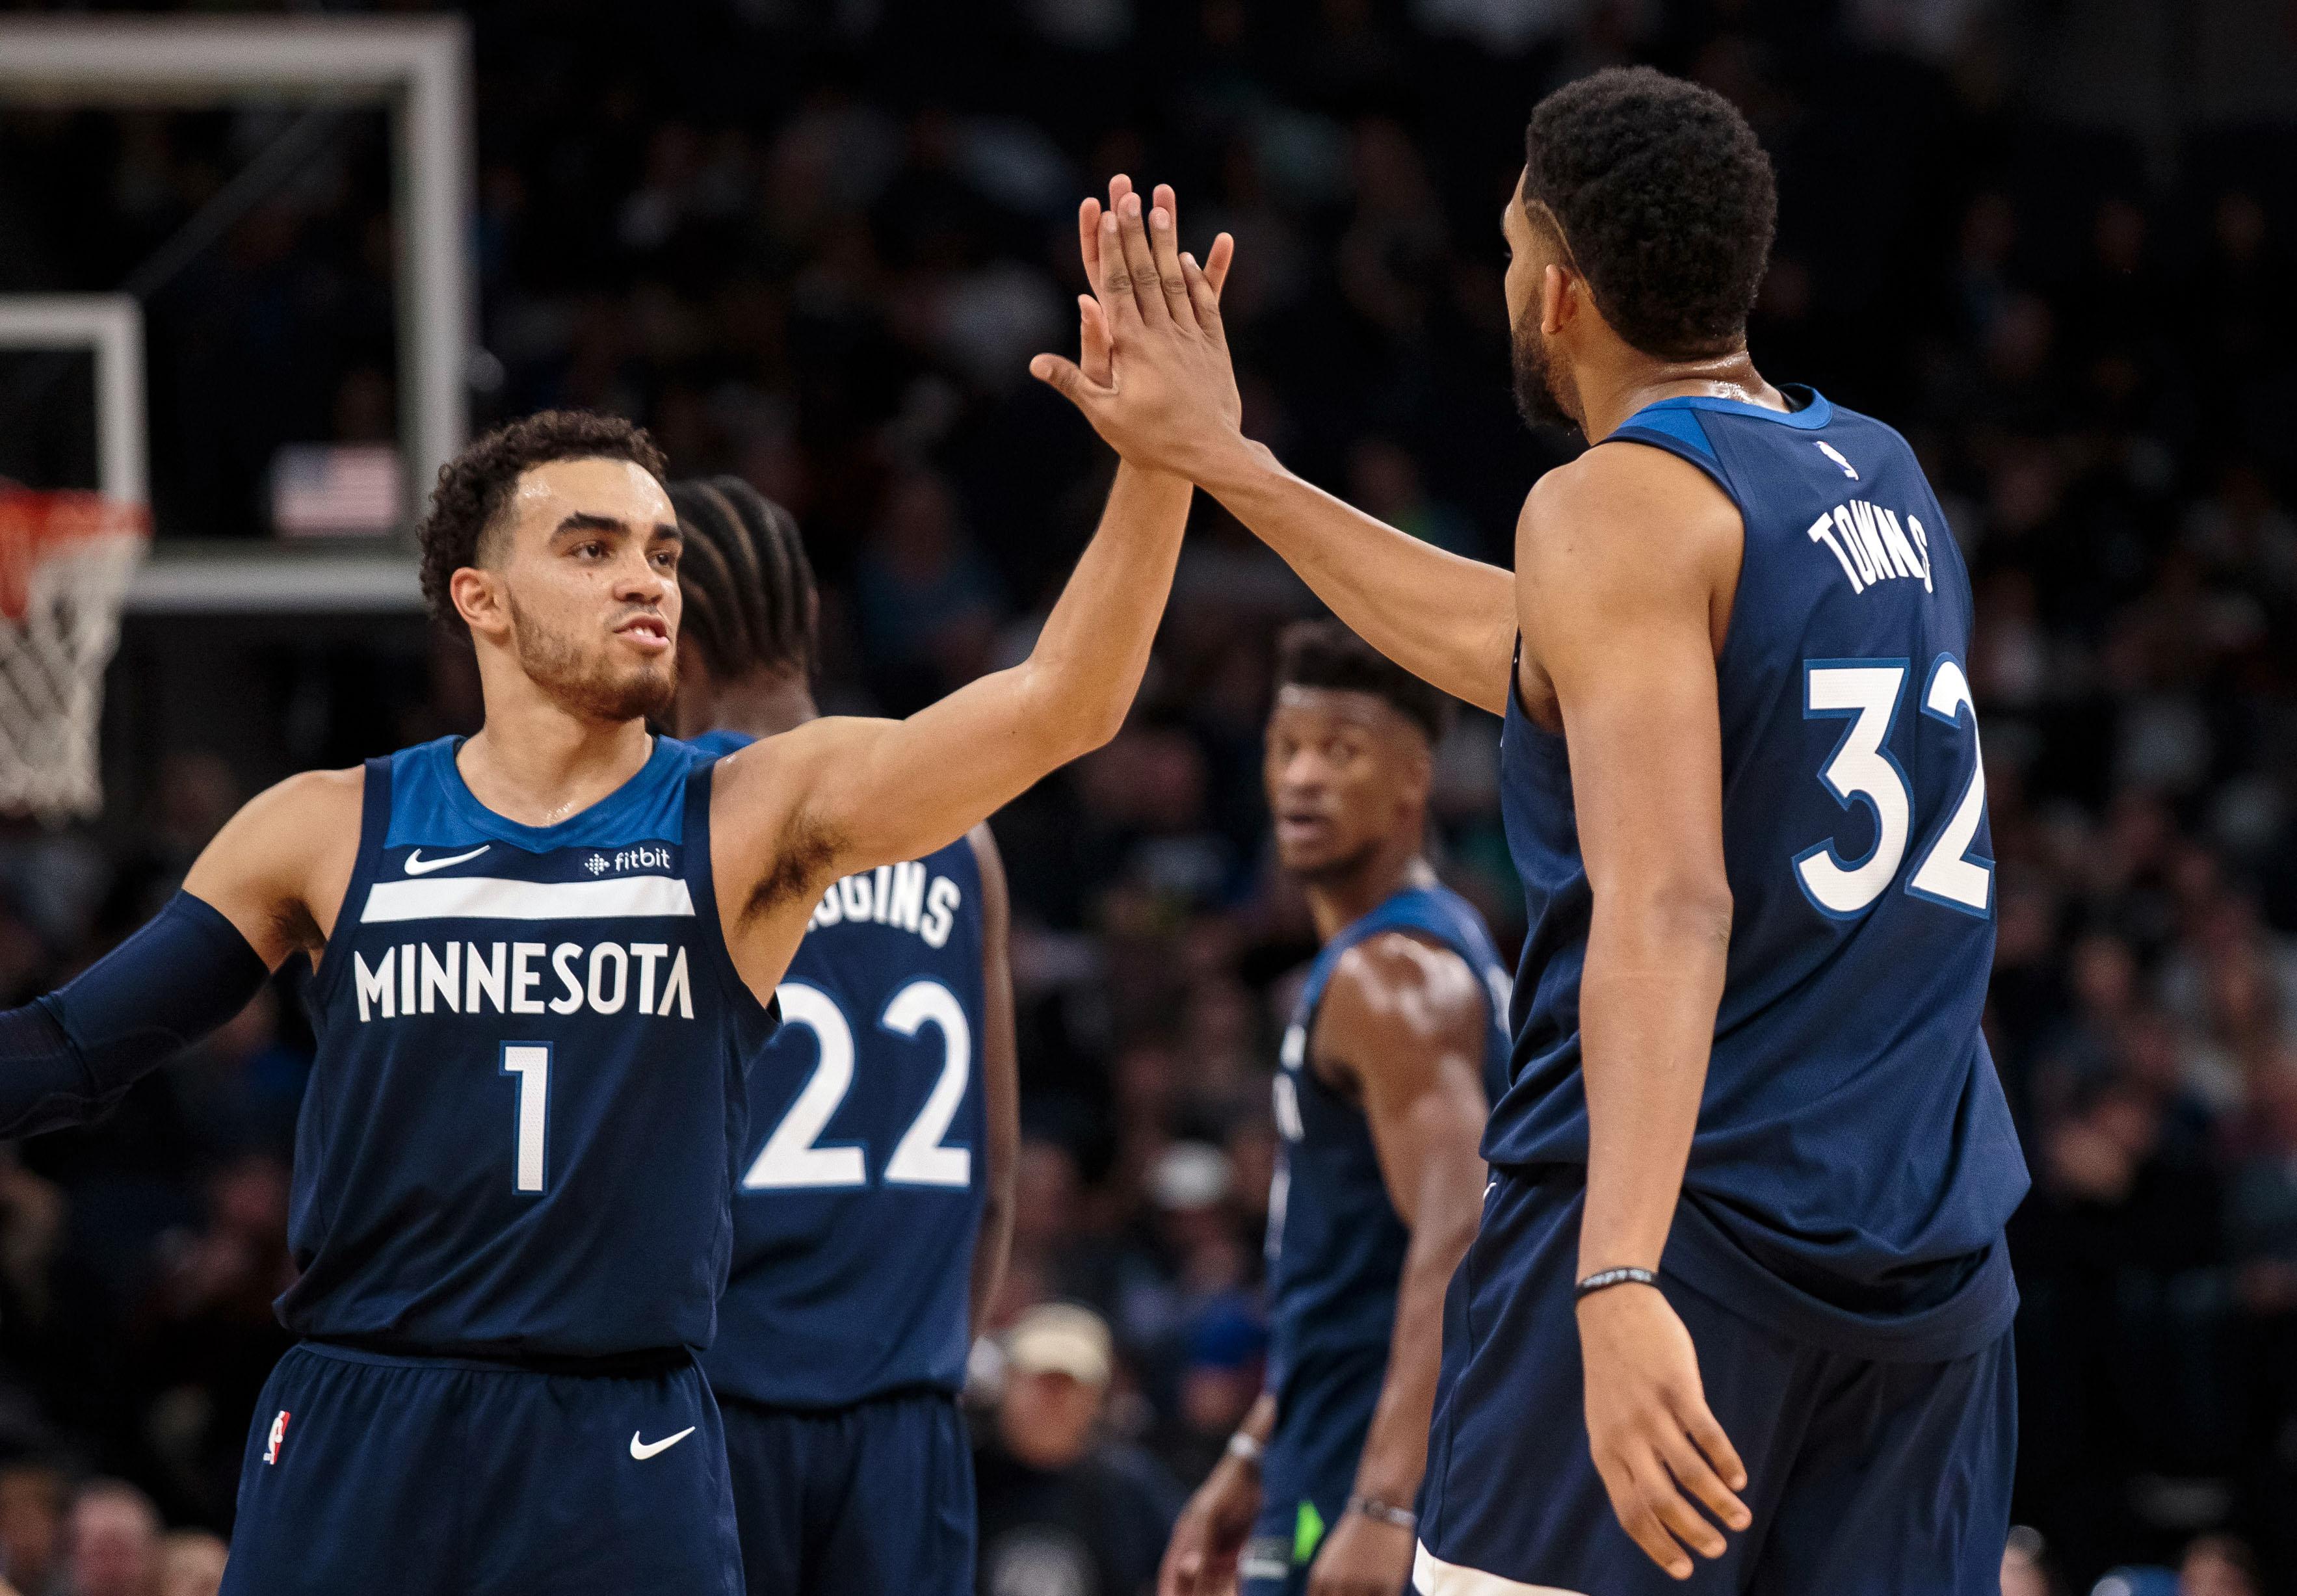 NBA: Phoenix Suns at Minnesota Timberwolves